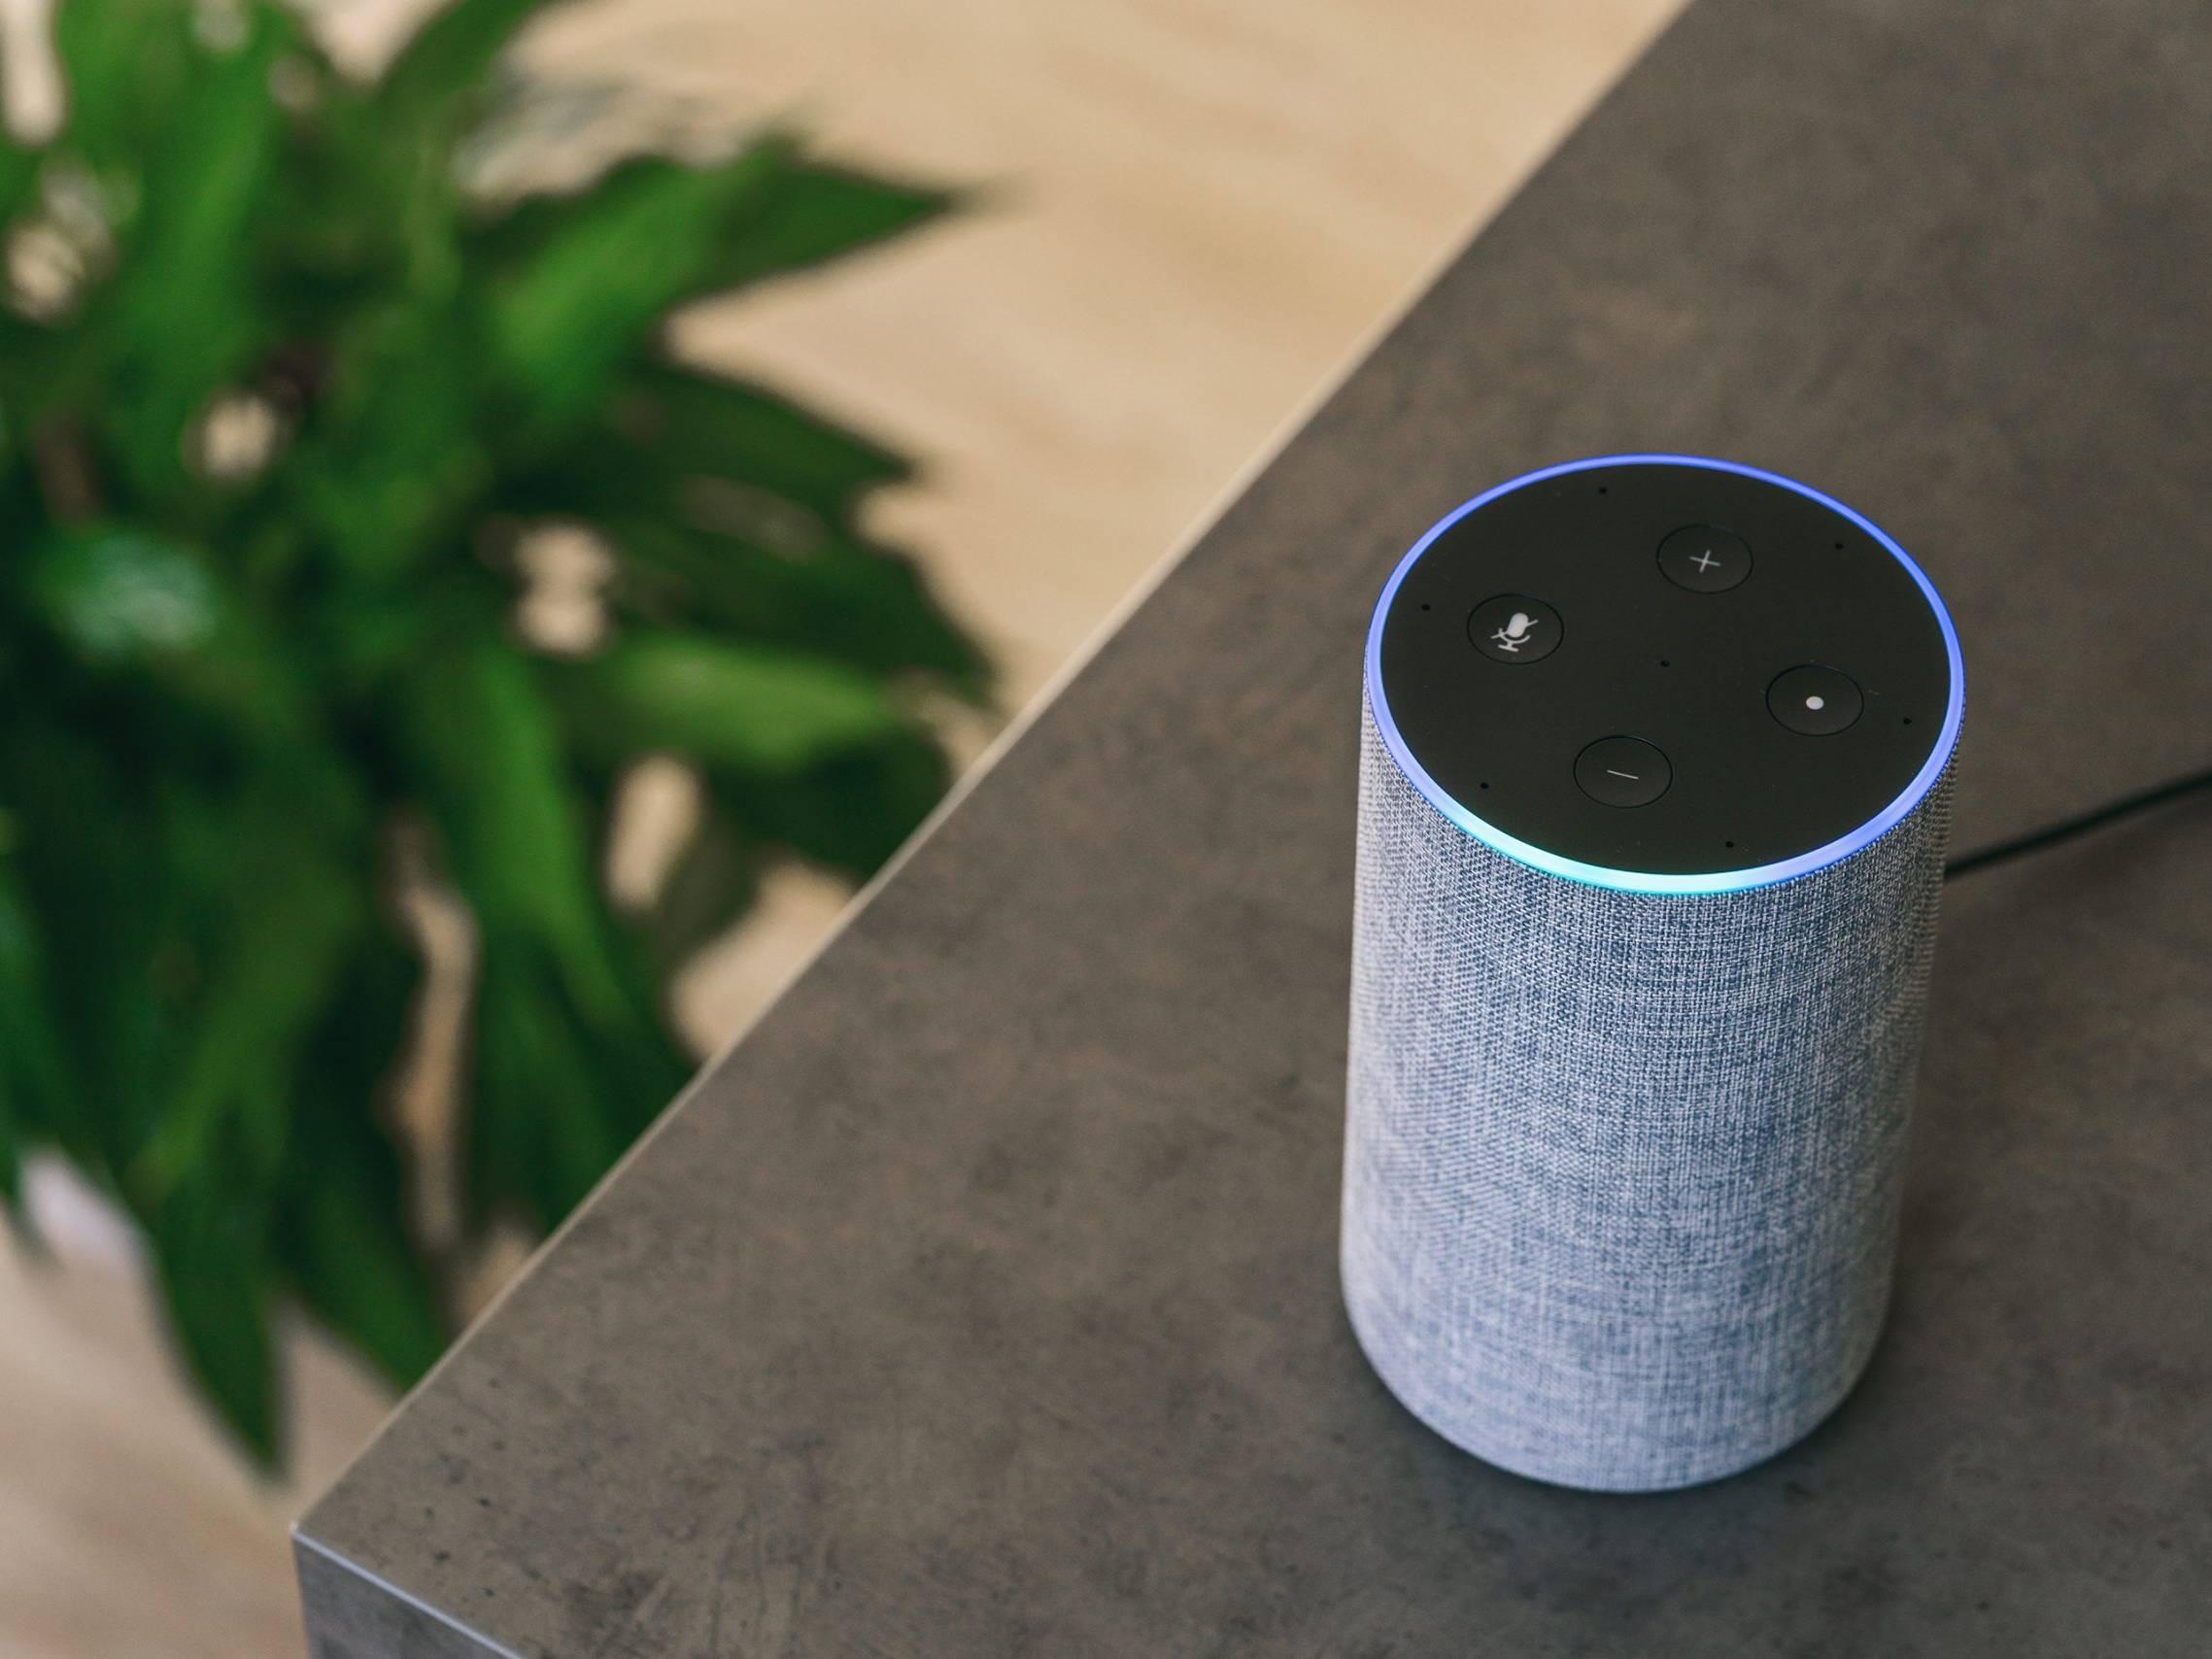 Amazon Echo smart speaker DMG